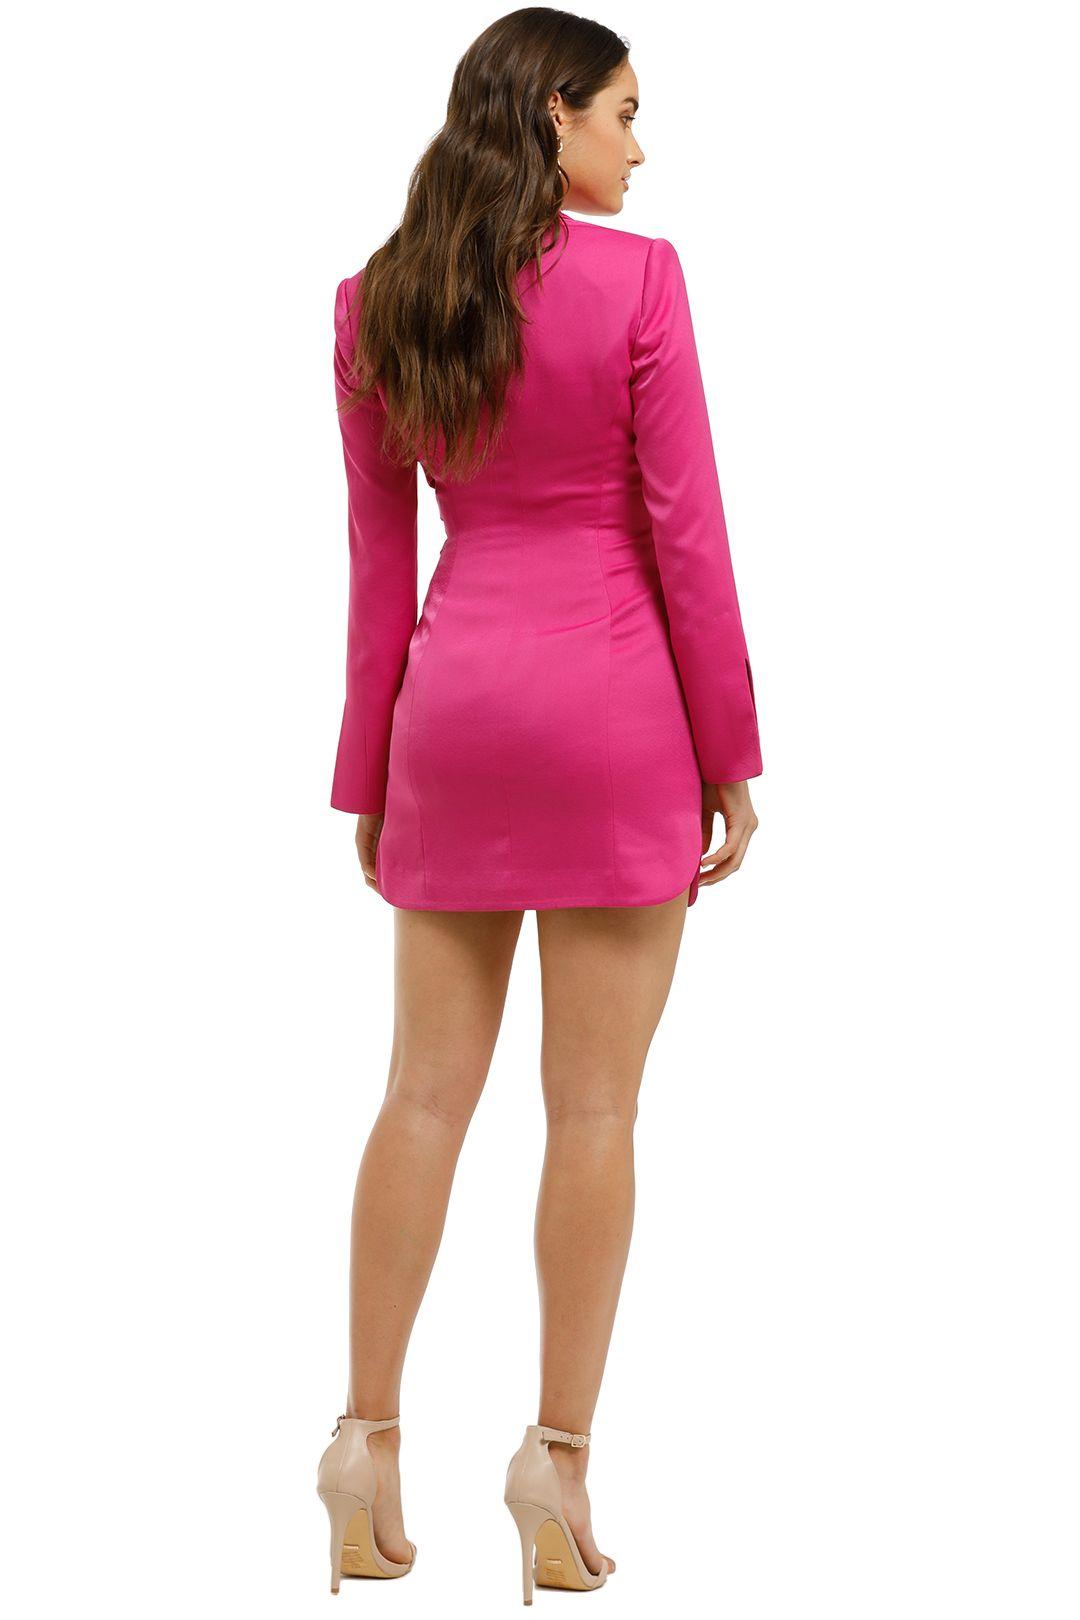 Misha Collection - Teagan Dress - Fuschia - Back